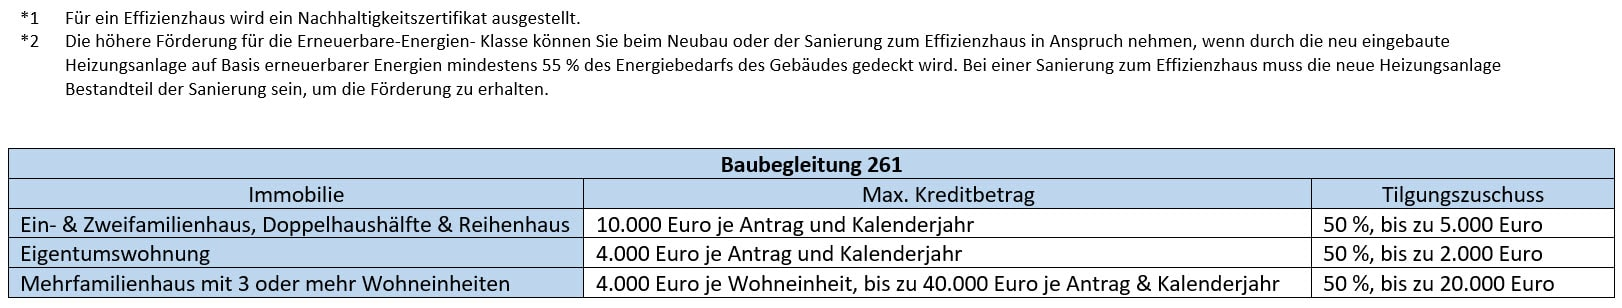 Baubegleitung 261-- BEG WG – Neubau (Programm 261), Kaufering, Buchloe, Landsberg am Lech, Augsburg, Penzing, Igling